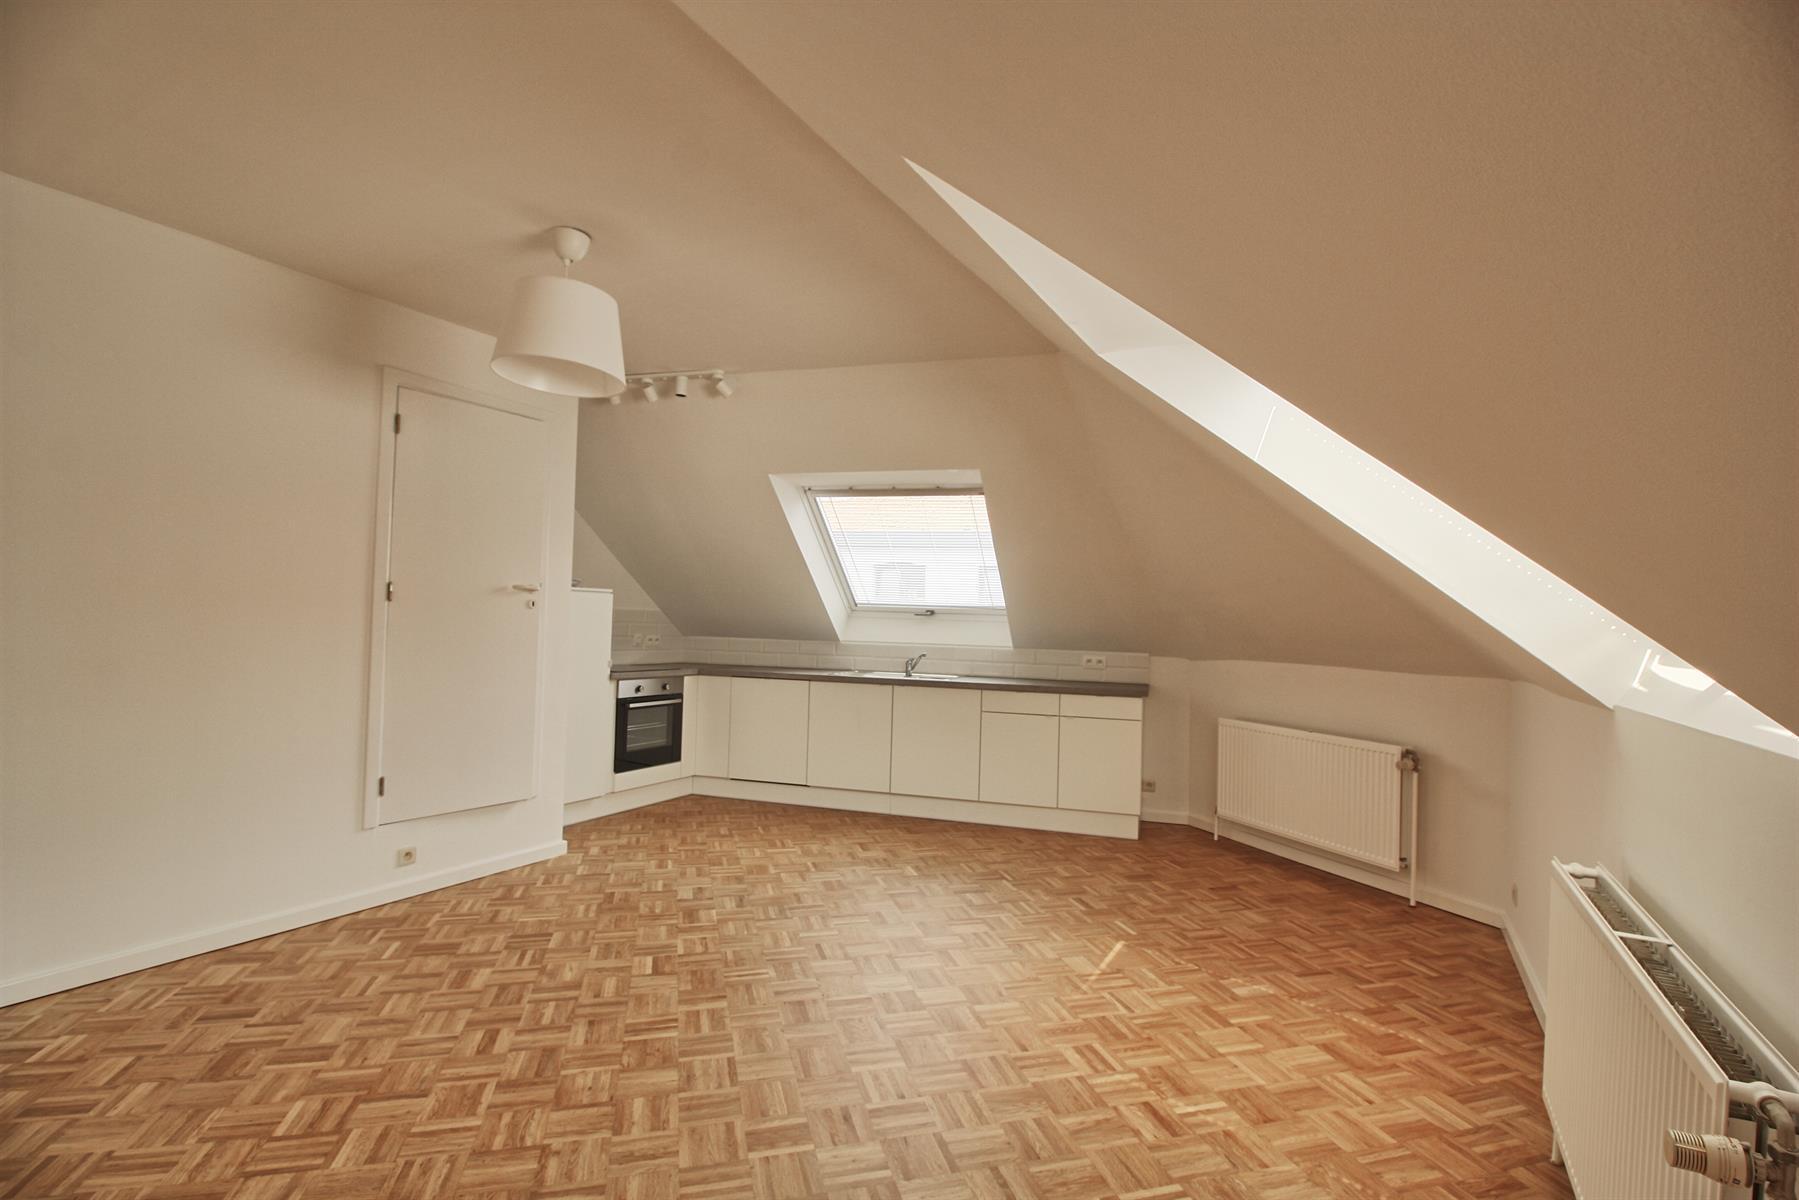 Flat - Etterbeek - #4277250-1